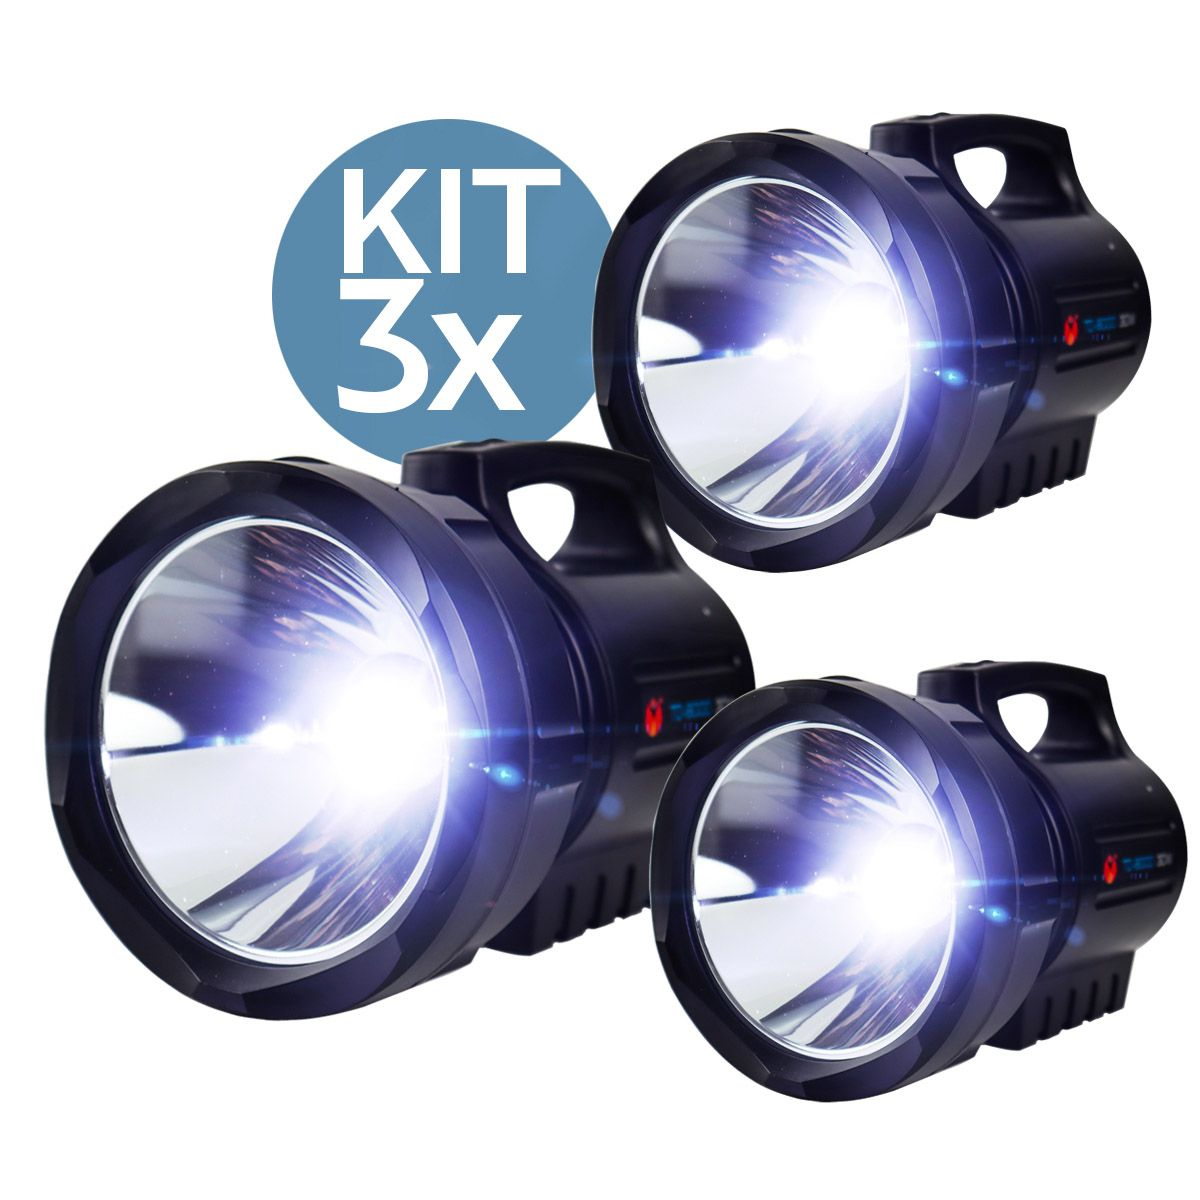 Kit 3x Lanterna Led Holofote Recarregável TD-8000